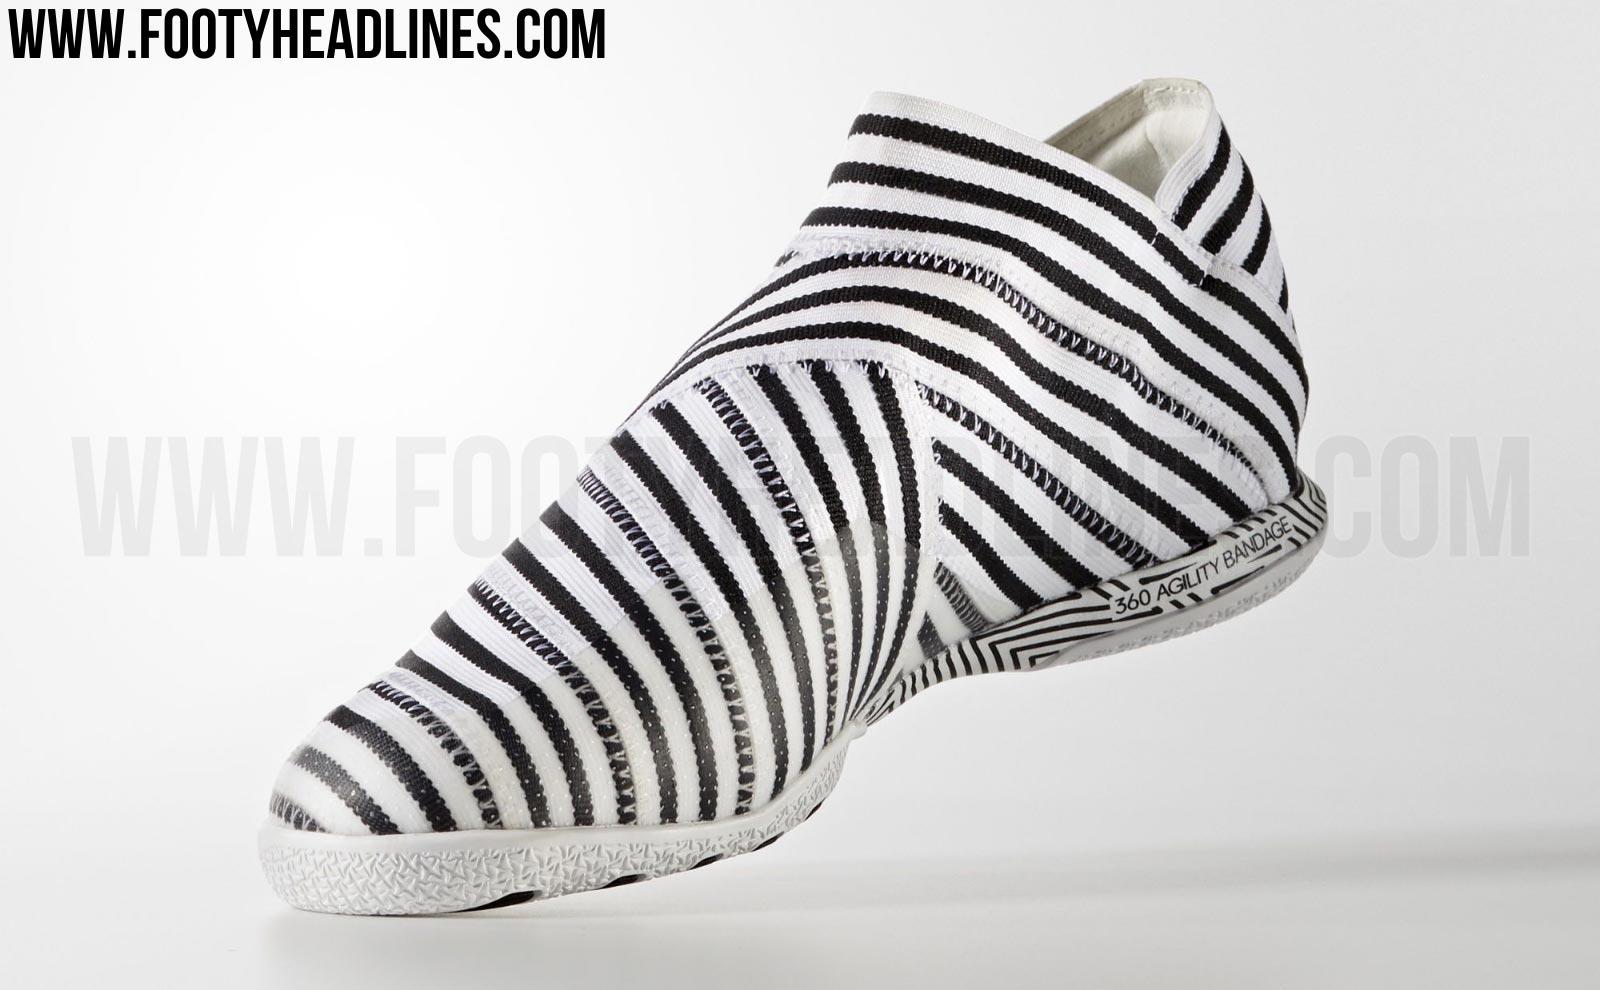 b112f30ec757 ... Adidas Nemeziz Tango 17+ 360Agility Dust Storm Boots Reveale ...